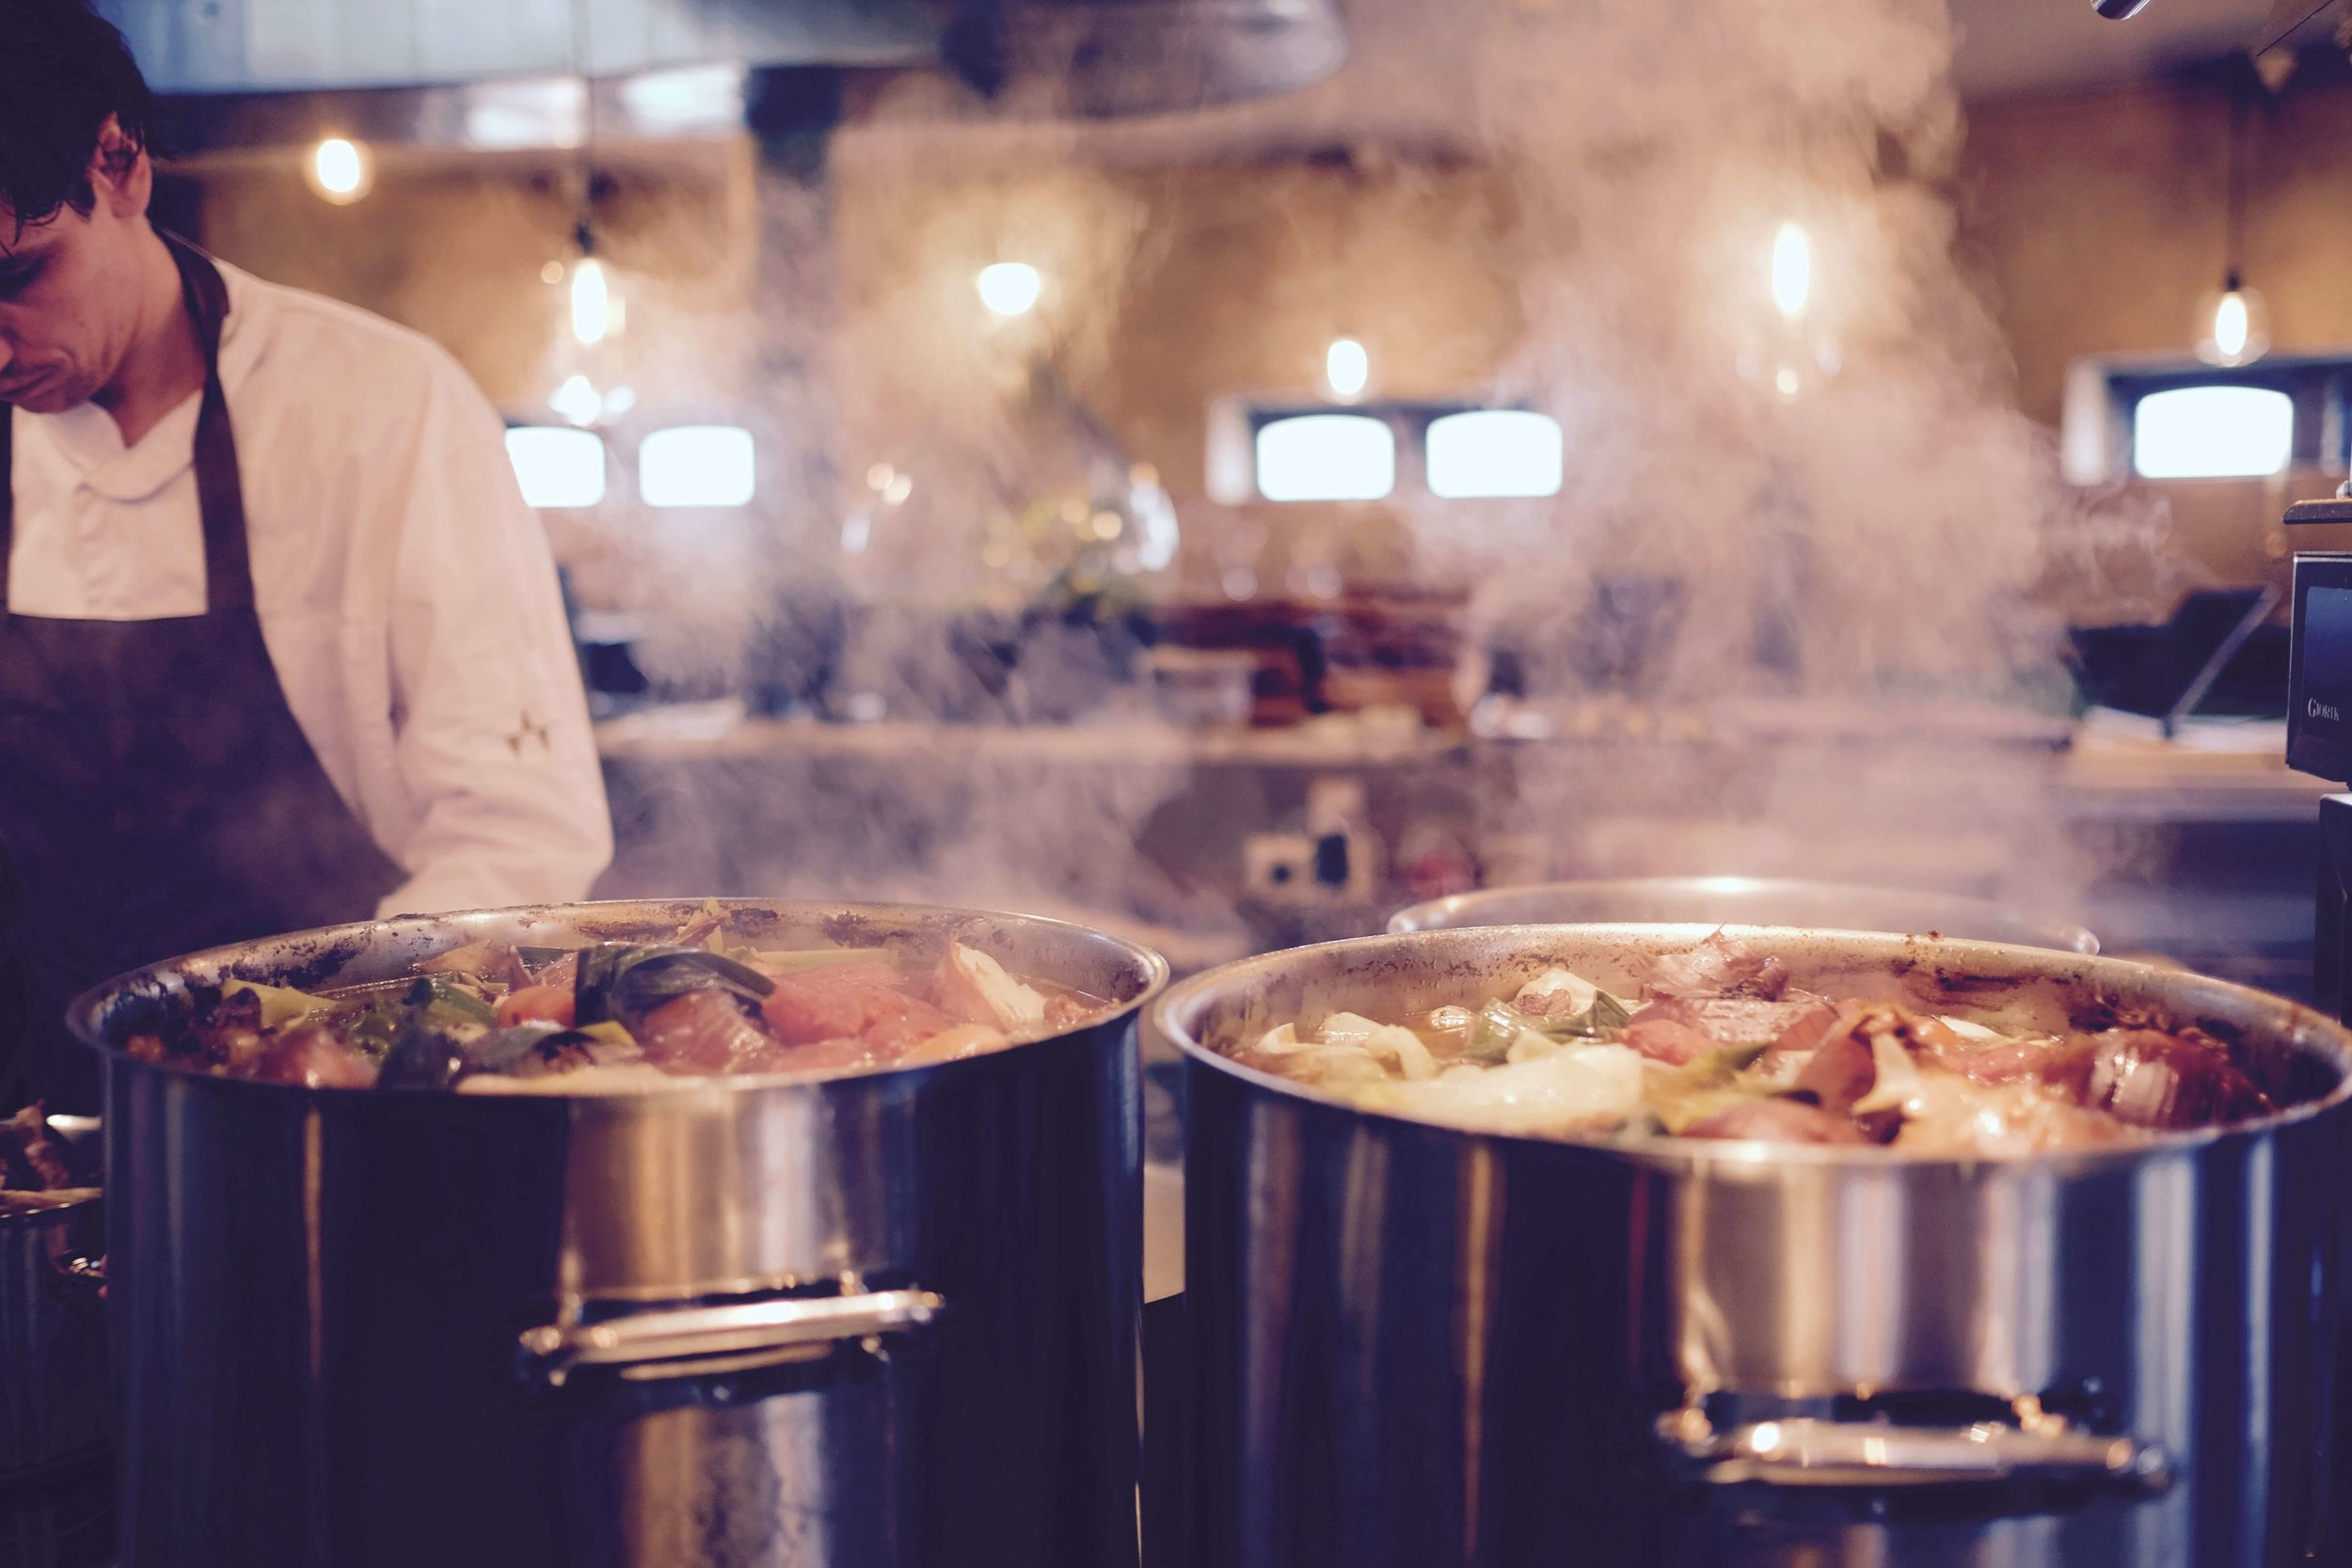 chef-cooking-dinner-66639.jpg